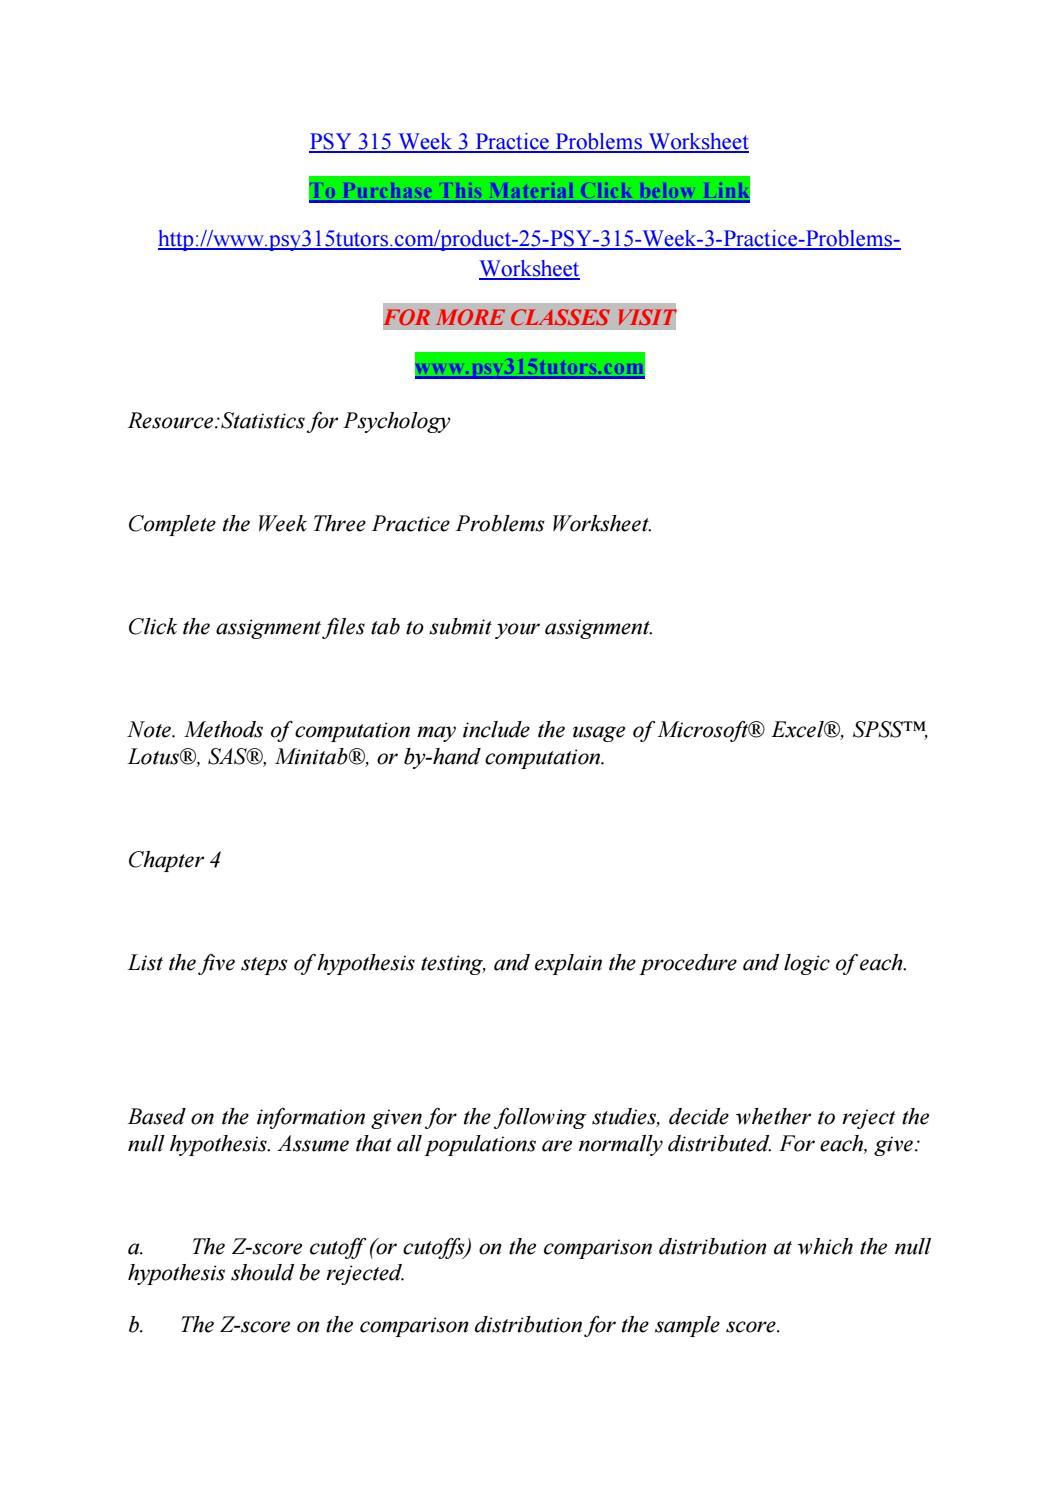 Psy 24 week 24 practice problems worksheet by chanduchagam24 - issuu Within Z Score Practice Worksheet